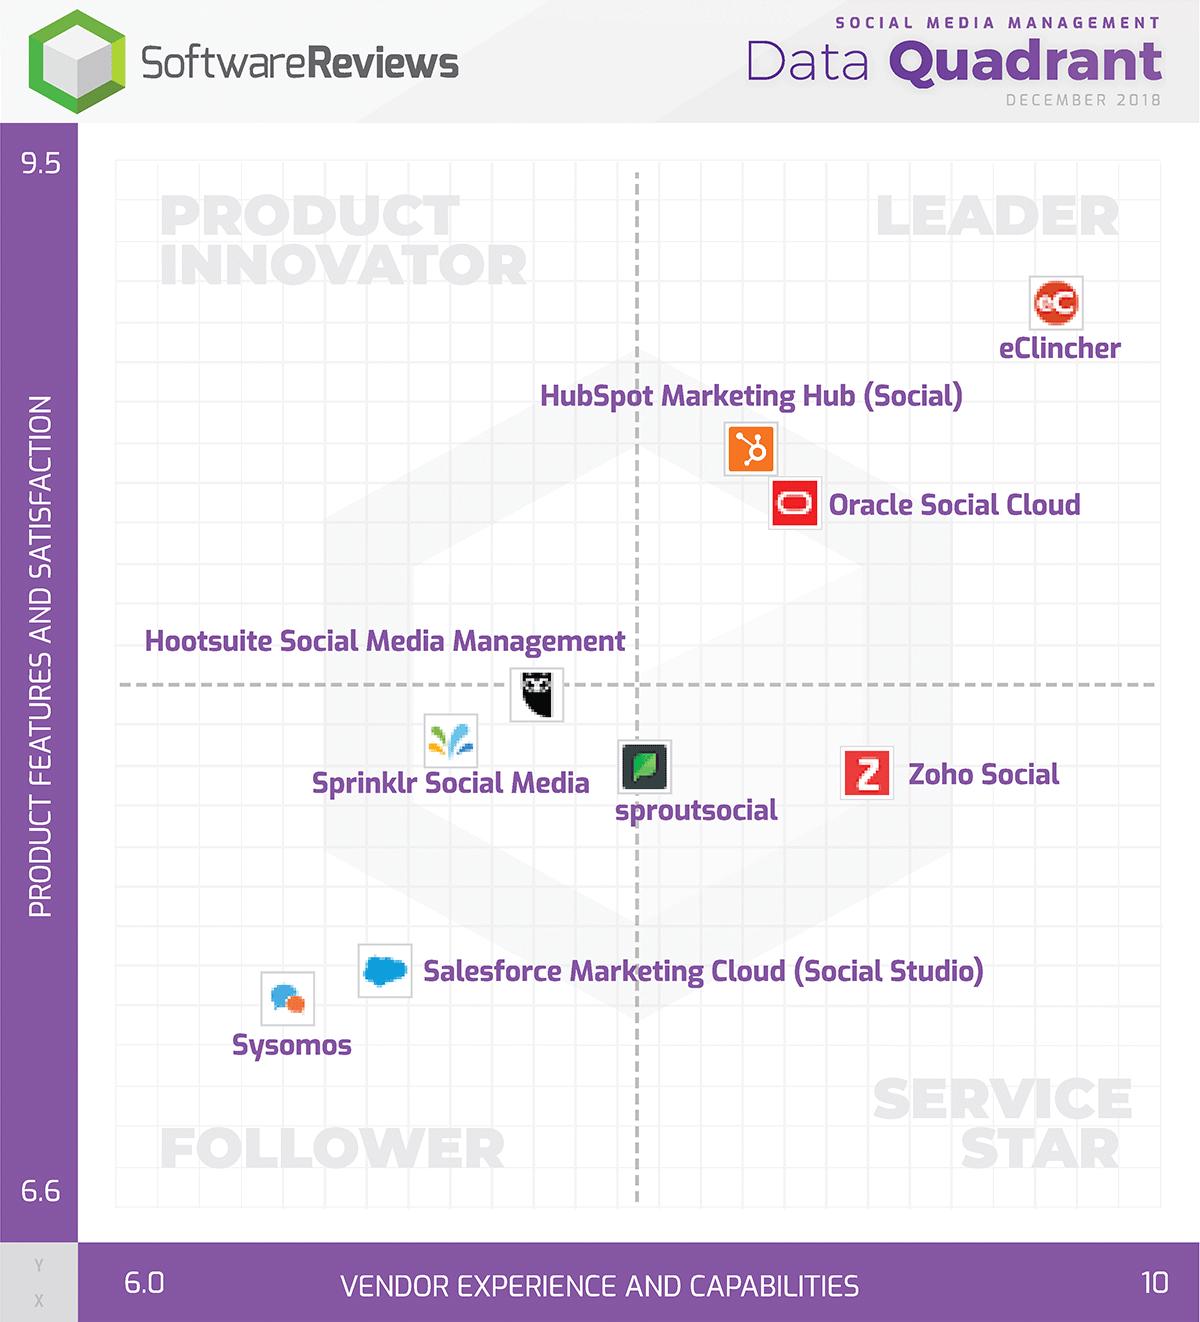 Social Media Management Data Quadrant